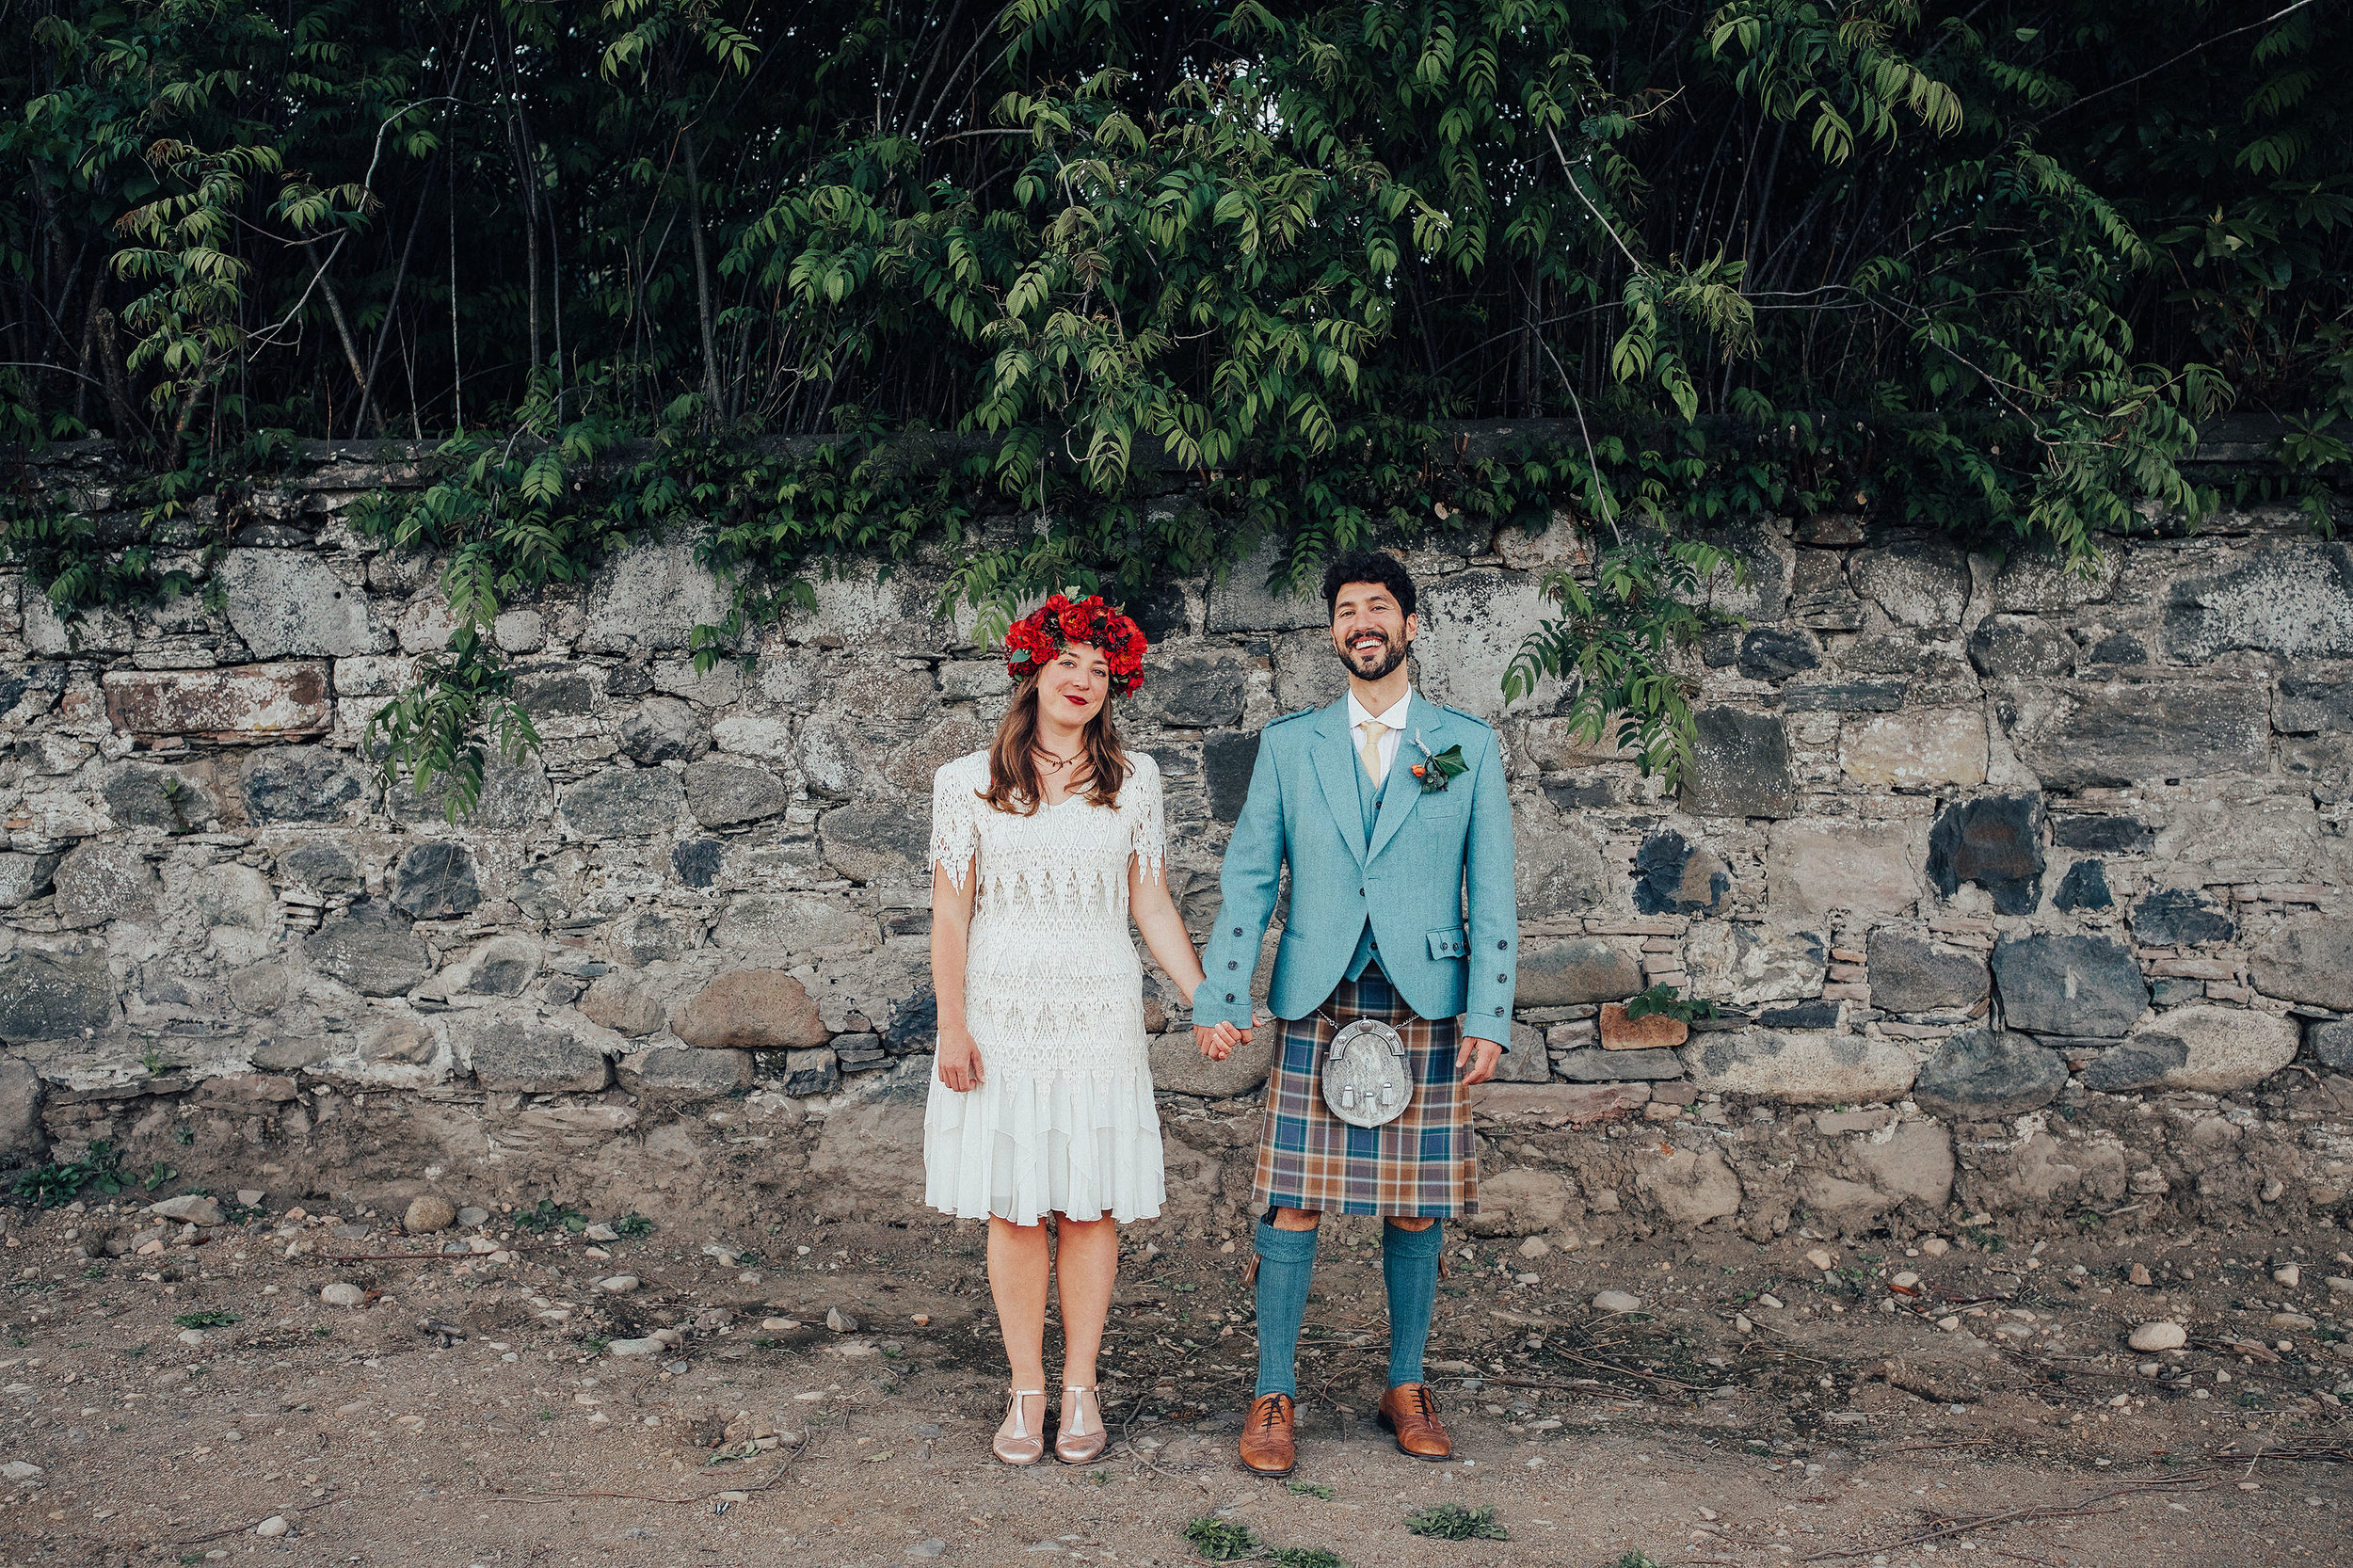 COMRIE_CROFT_WEDDINGS_PJ_PHILLIPS_PHOTOGRAPHY_185.jpg